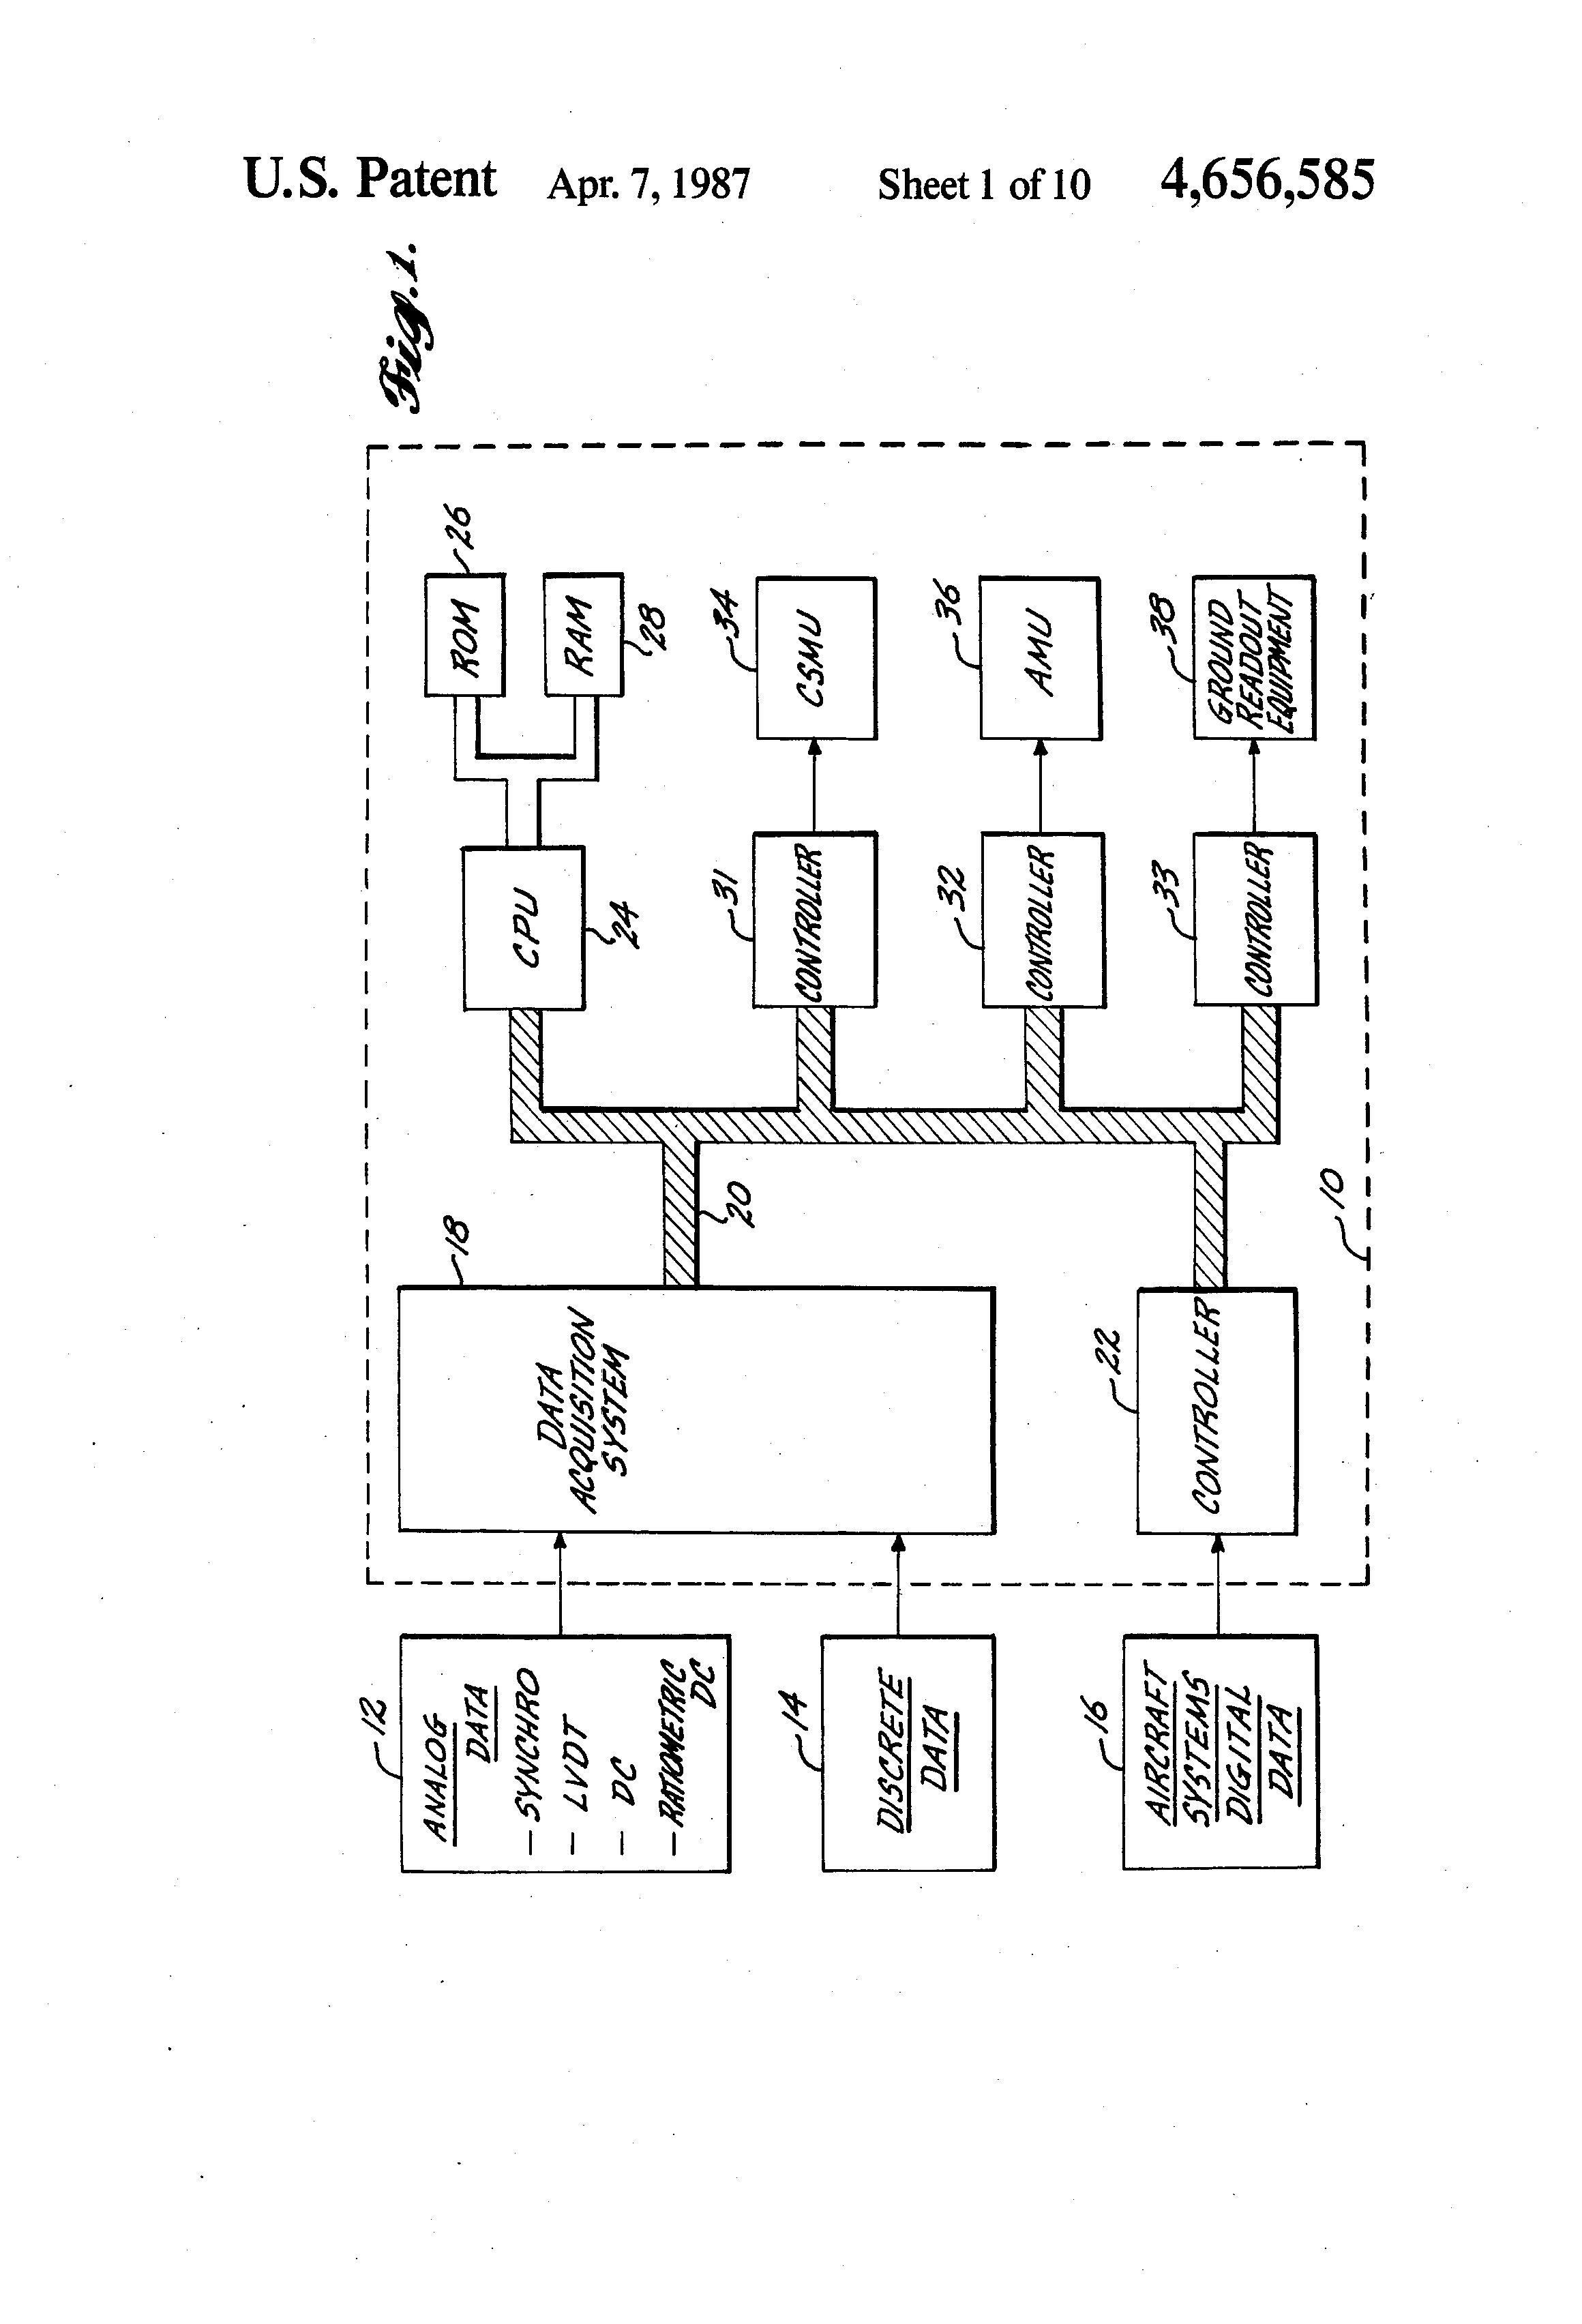 Aerospace Data Acquisition System : Patent us aircraft flight data recorder